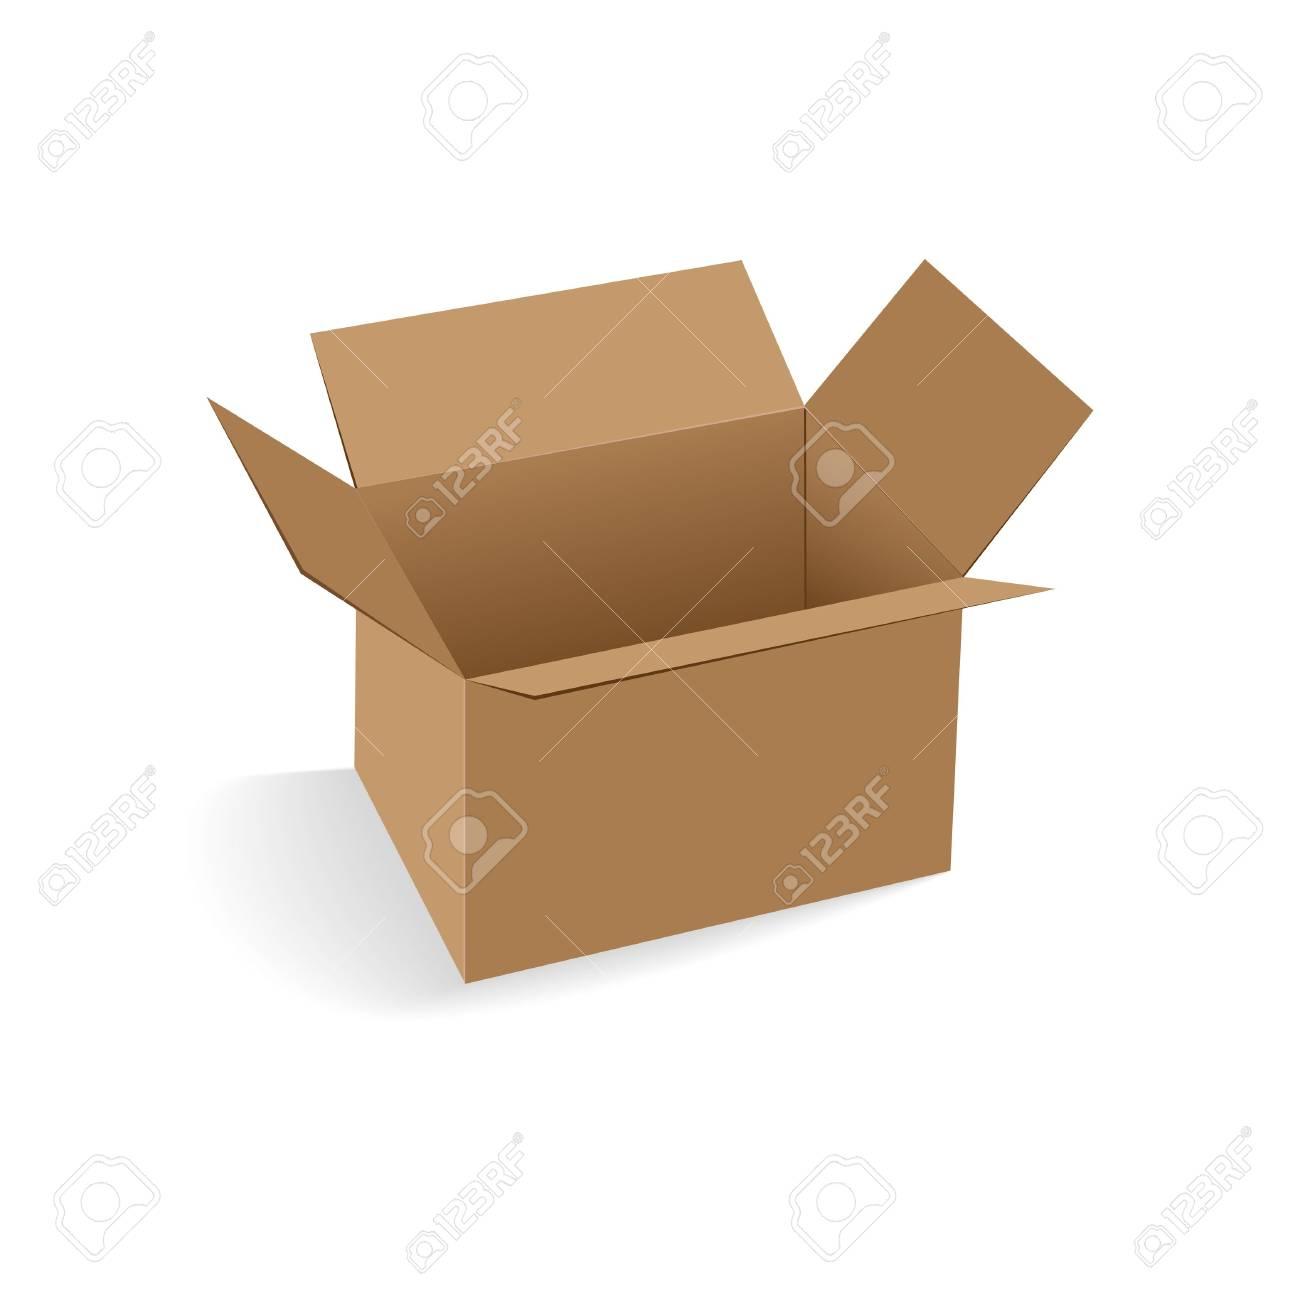 open empty cardboard box vector illustration Stock Vector - 14485876